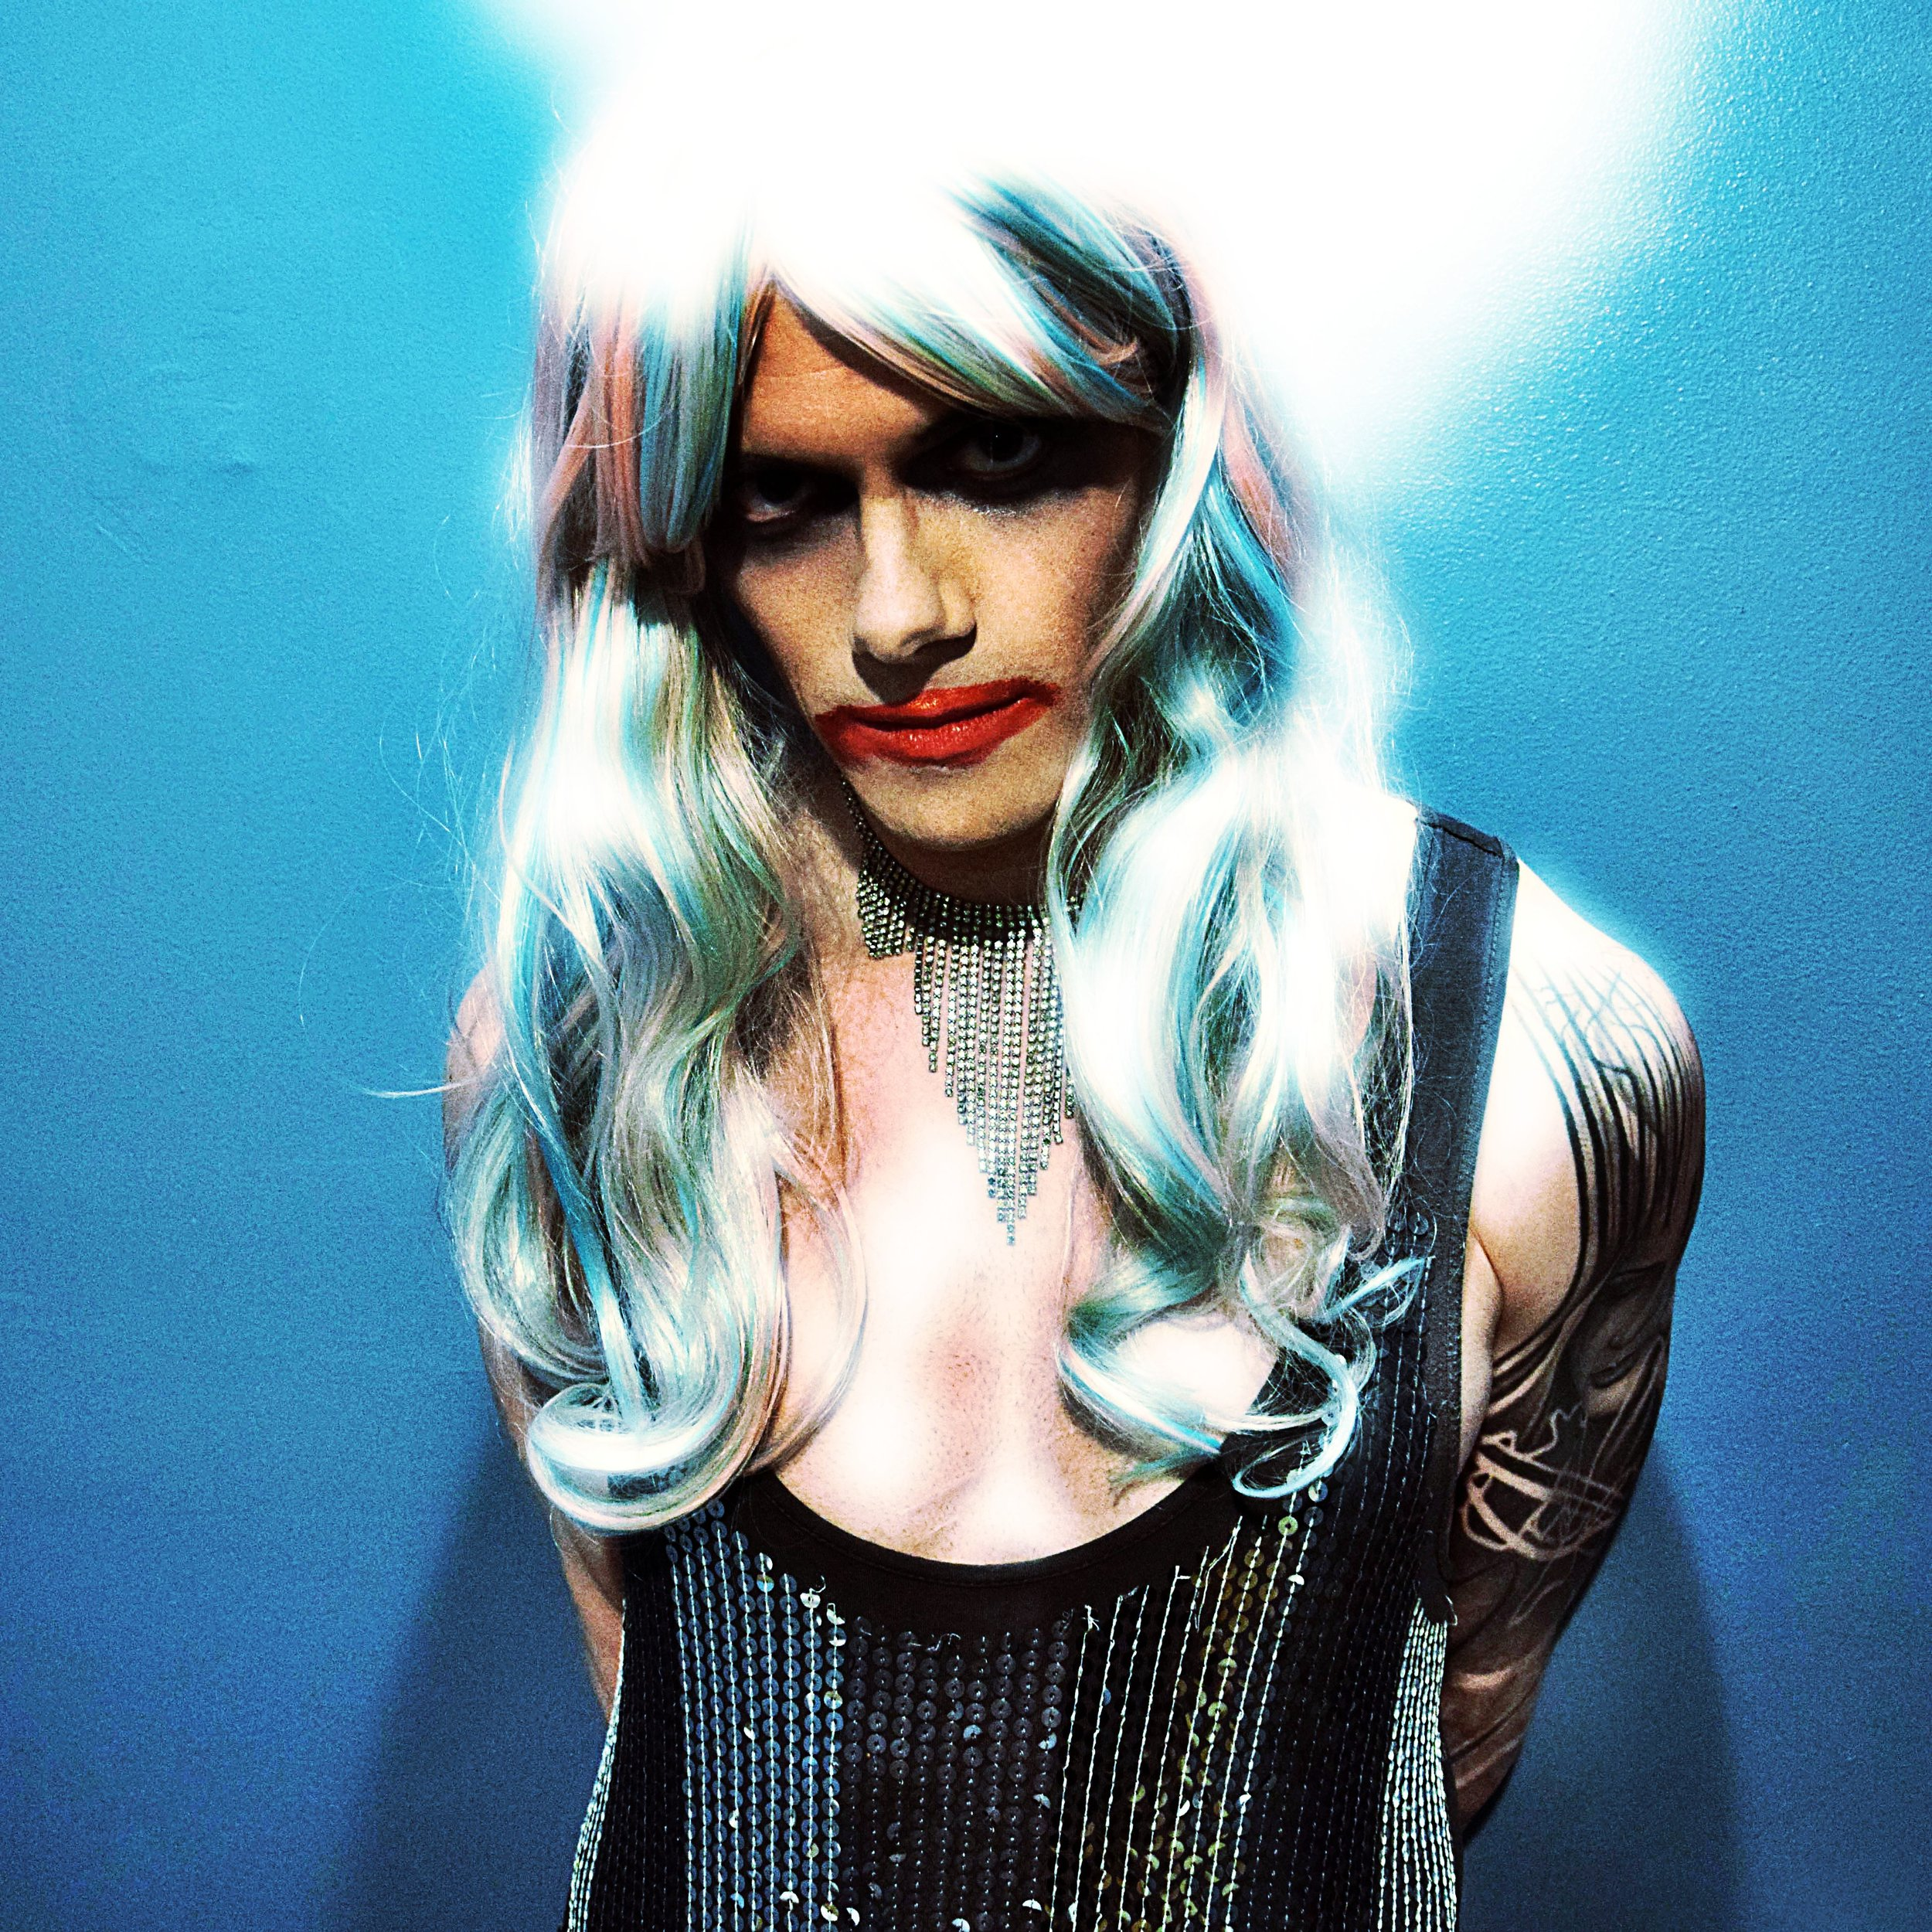 Kendall pose - fred hagrid.jpg